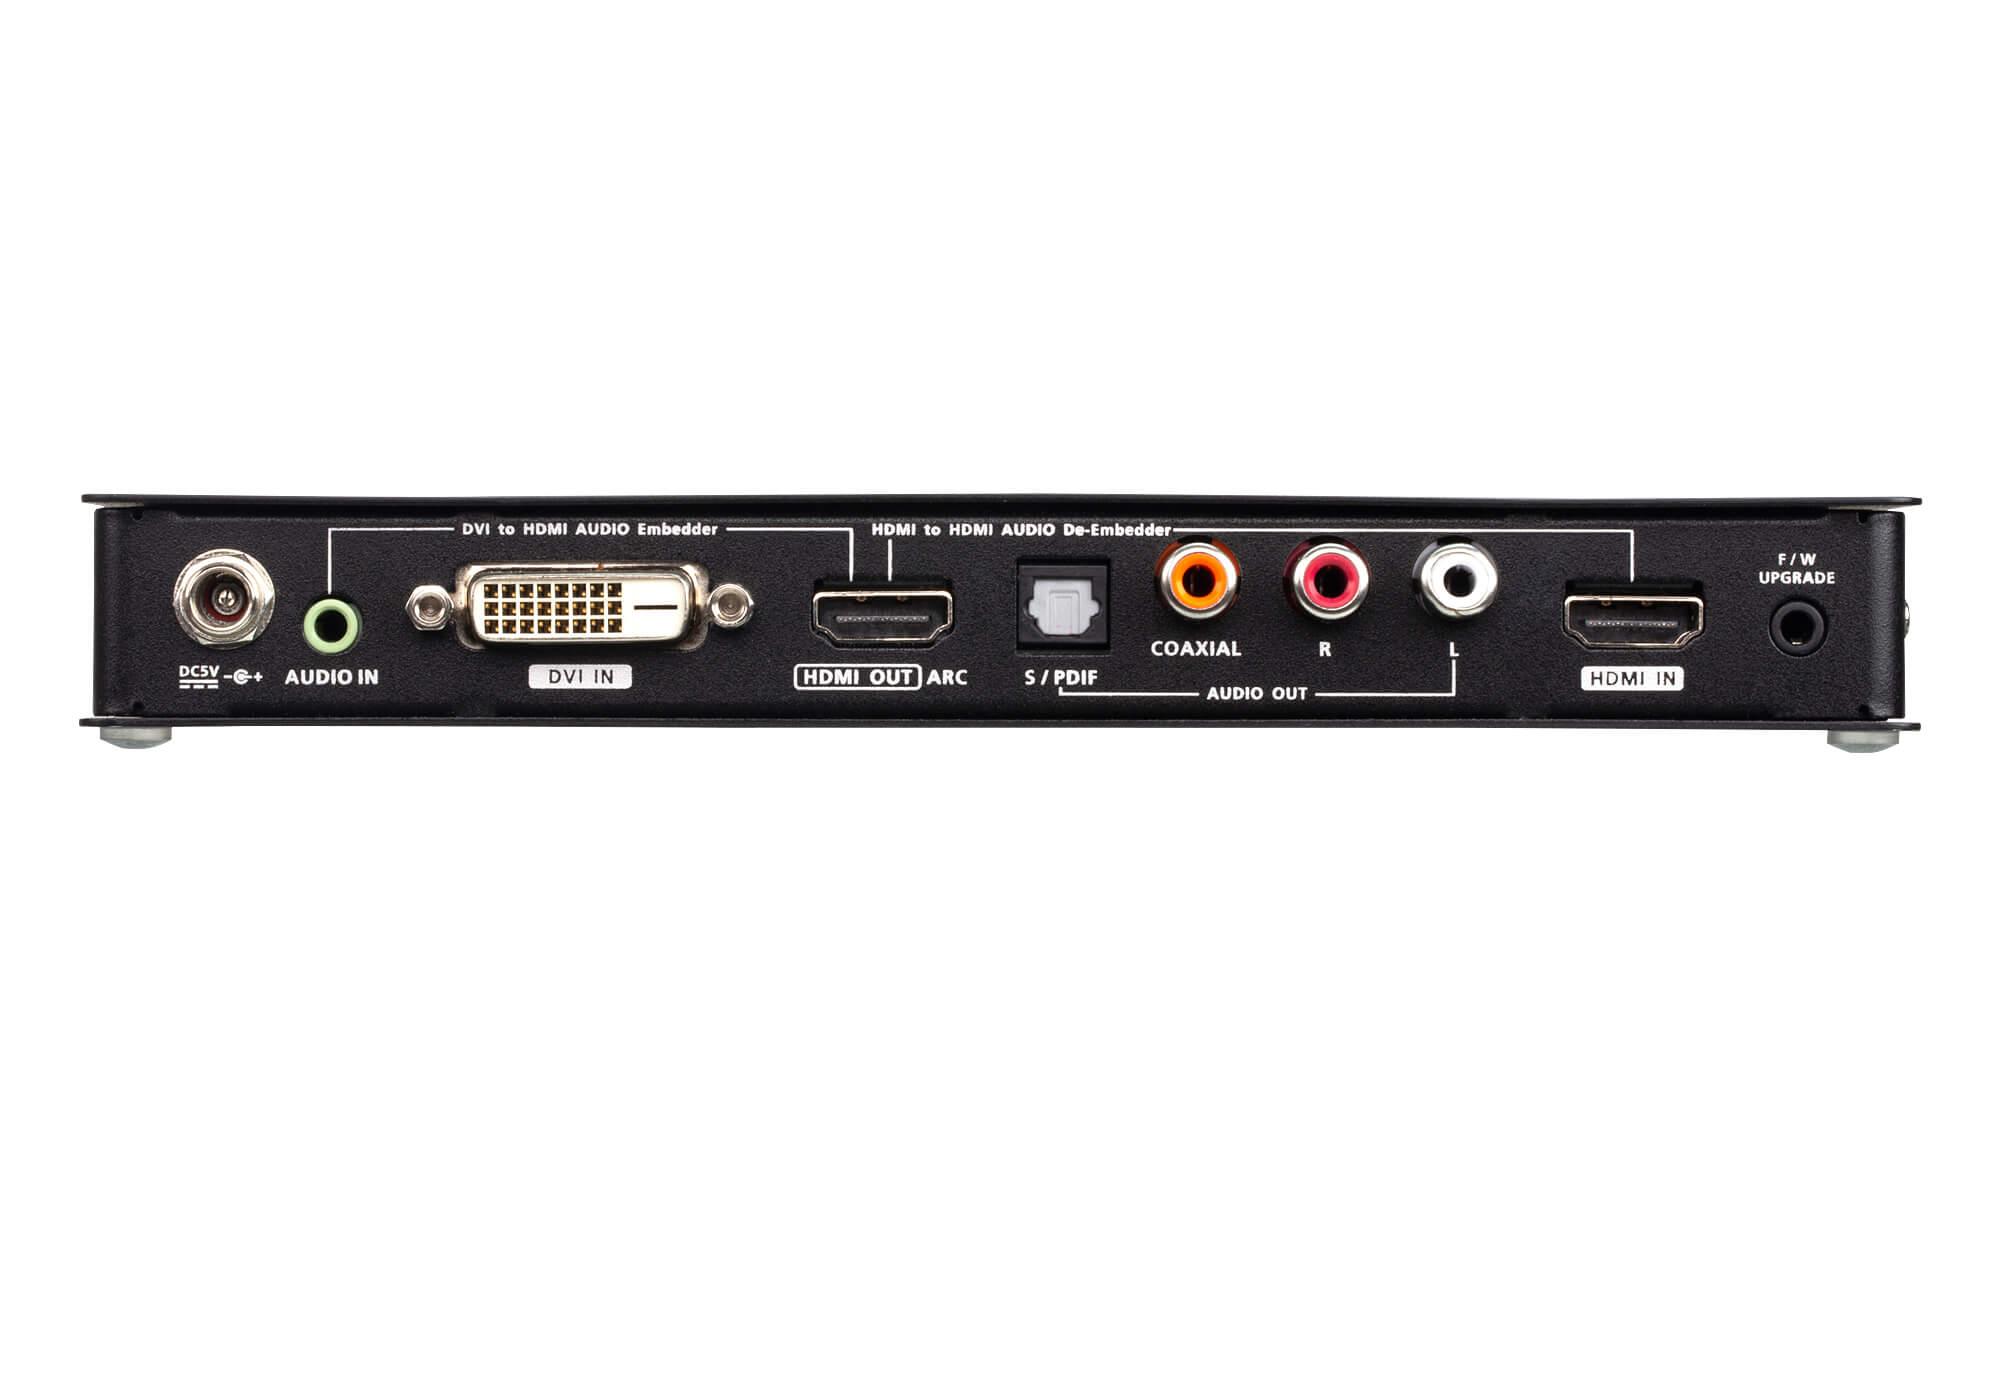 hight resolution of 4k hdmi dvi to hdmi converter with audio de embedder 2